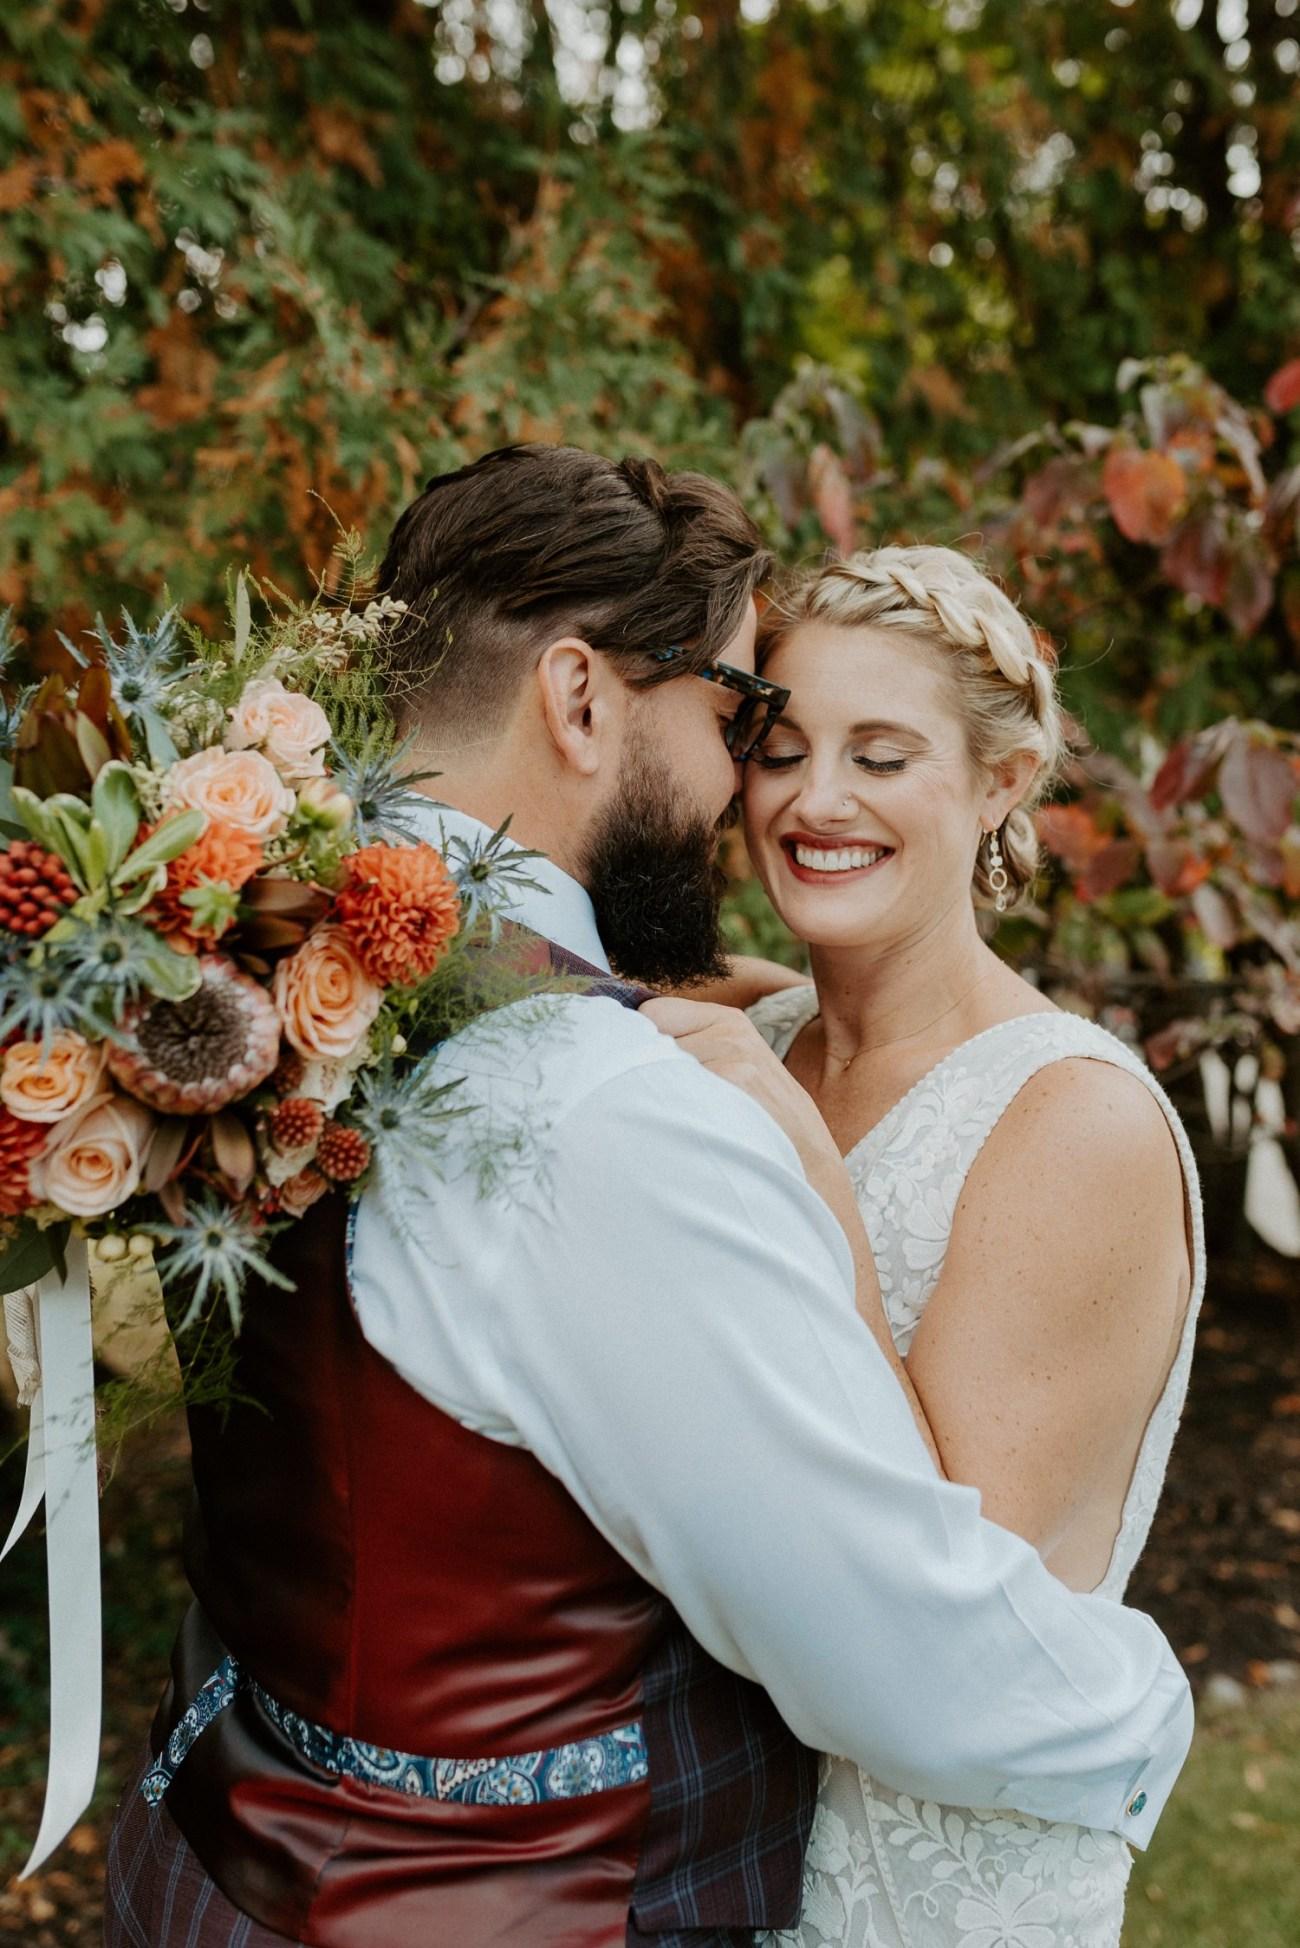 New Jersey Fall Backyard Wedding Bend Wedding Photographer NJ Wedding Photographer Anais Possamai Photography 020